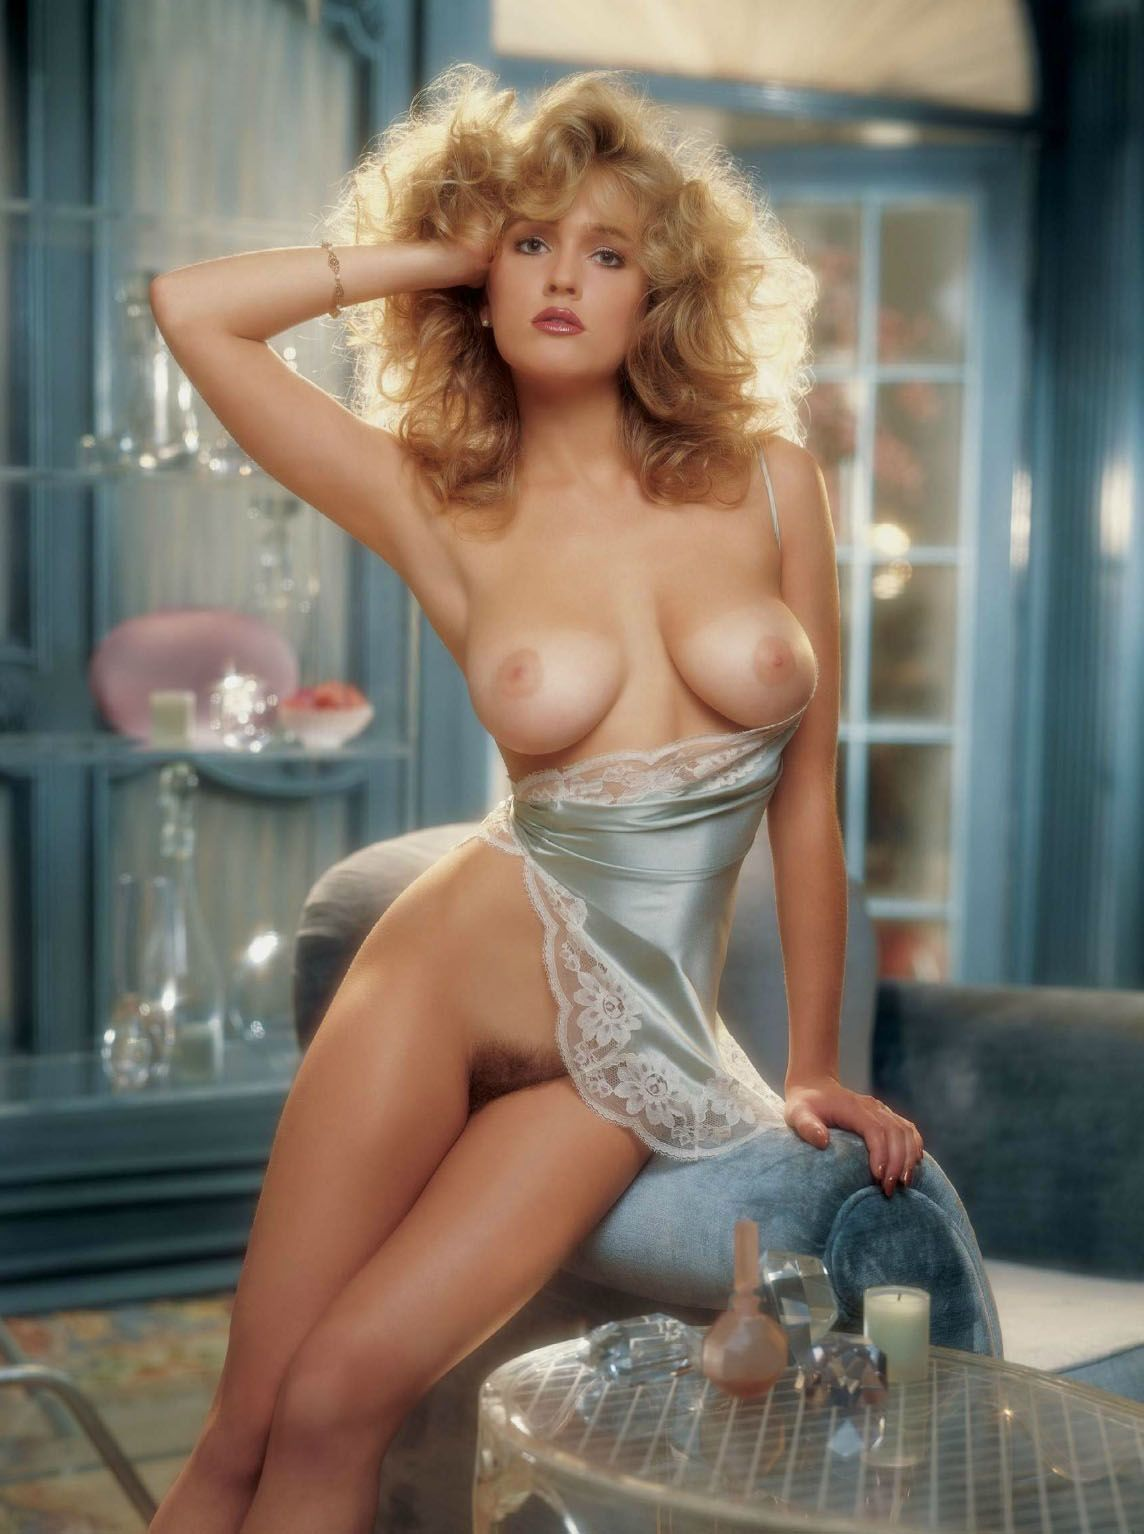 Penny nude photos-8824